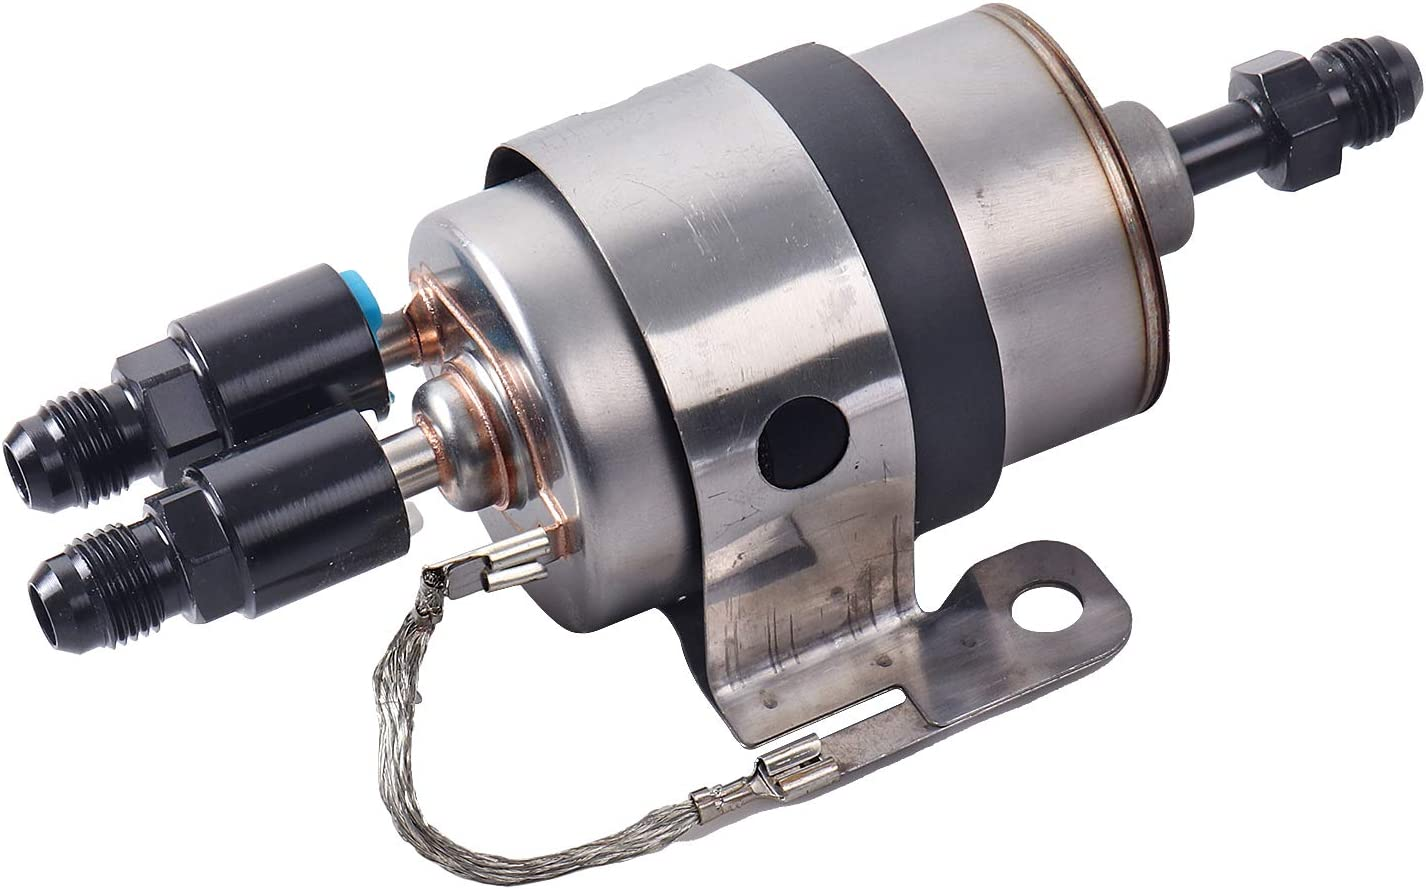 MOSTPLUS - 33737 GF822 10299146 quality 5 ☆ popular assurance EFI R Swap Pressure or Fuel LS